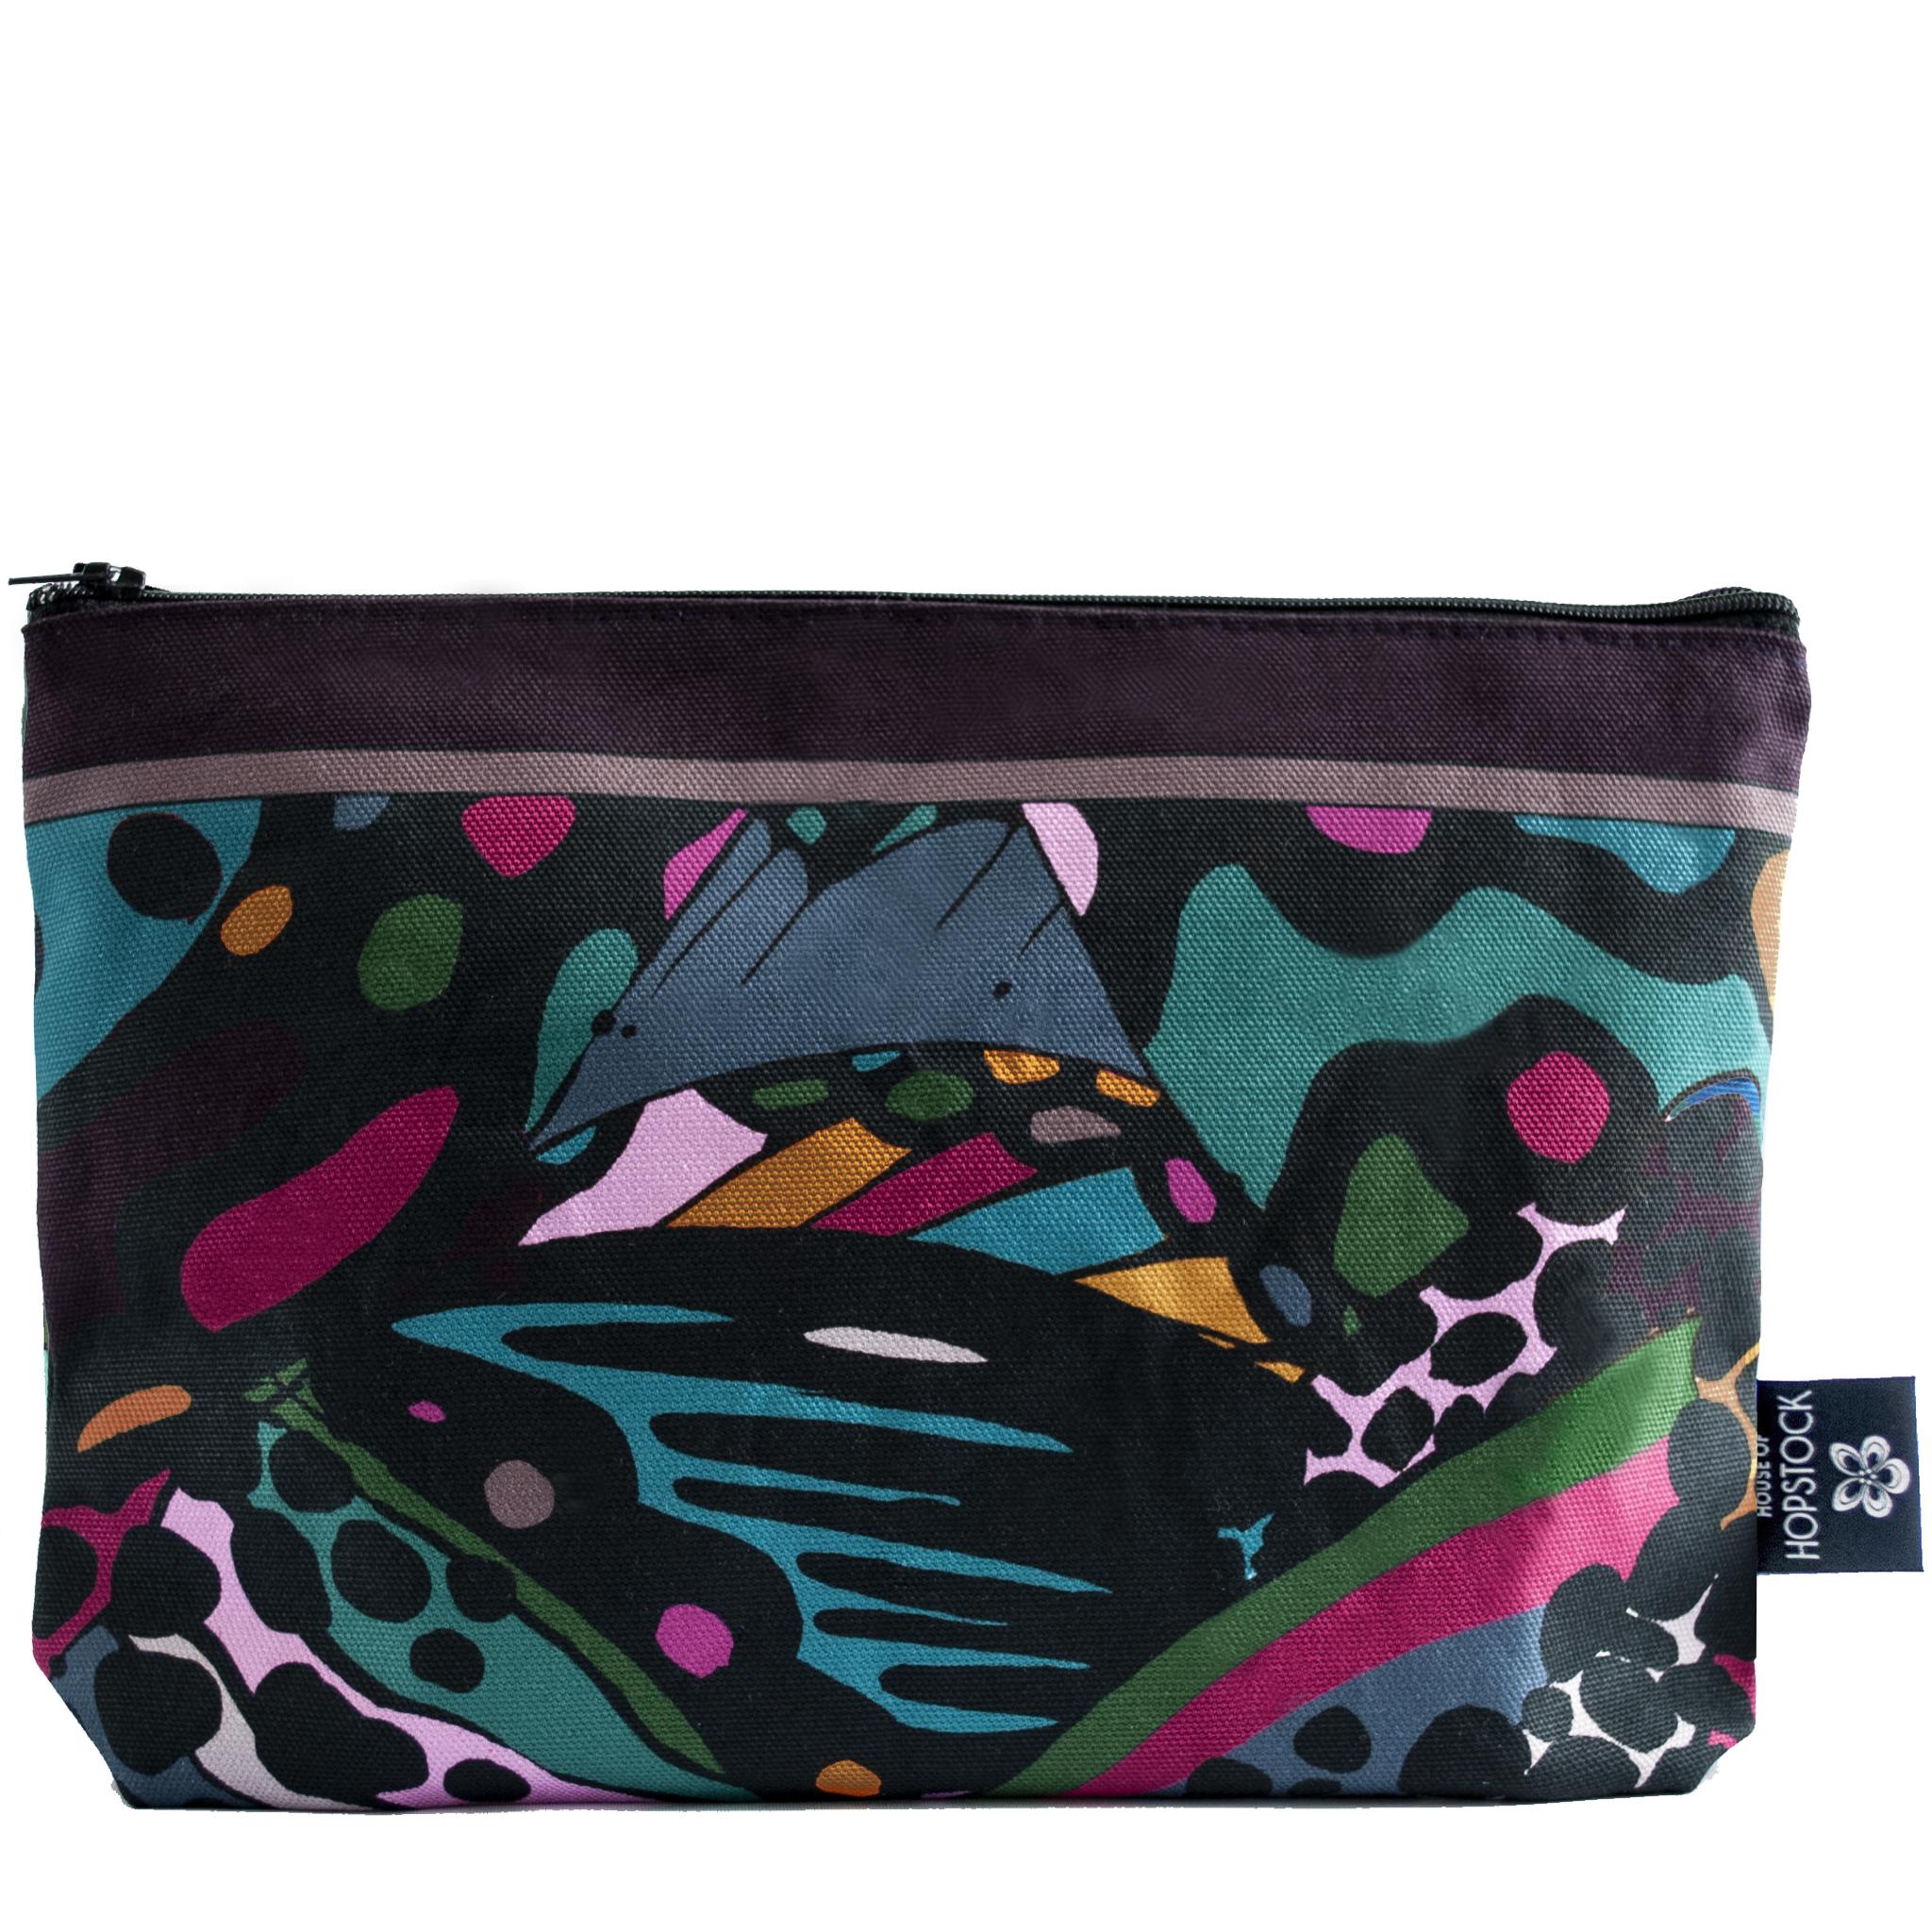 abstract art print makeup cosmetics wash bag collidoskope house of hopstock